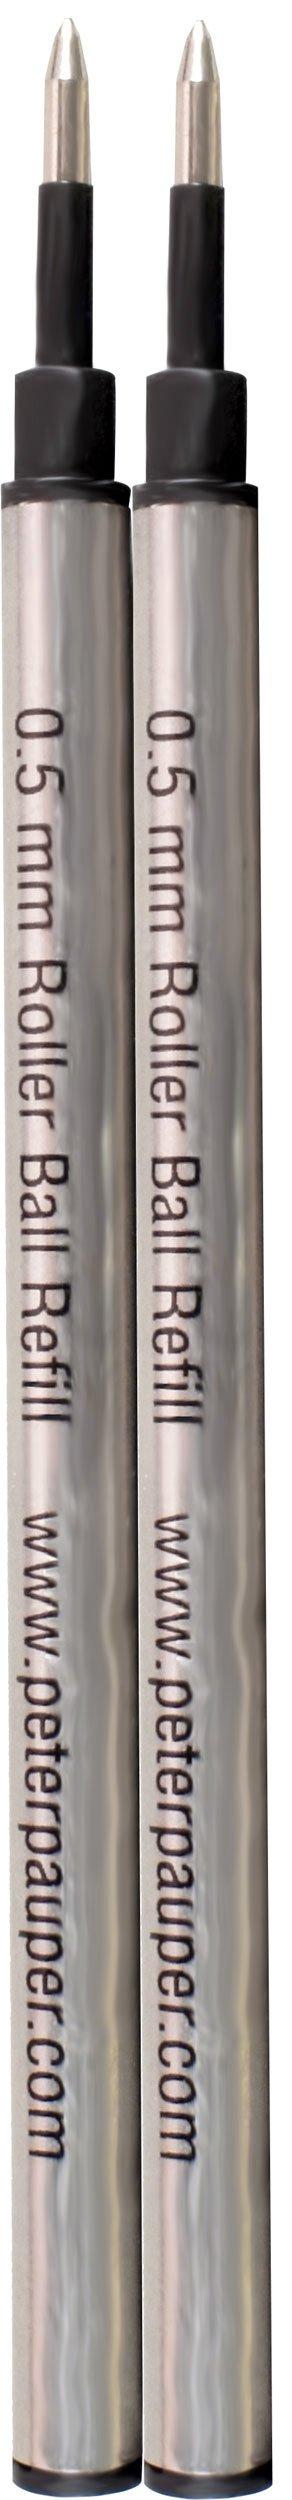 Roller Ball Pen Refill (2-Pack) (Rollerball Pen) (Designer Pens) by Peter Pauper Press (Image #3)